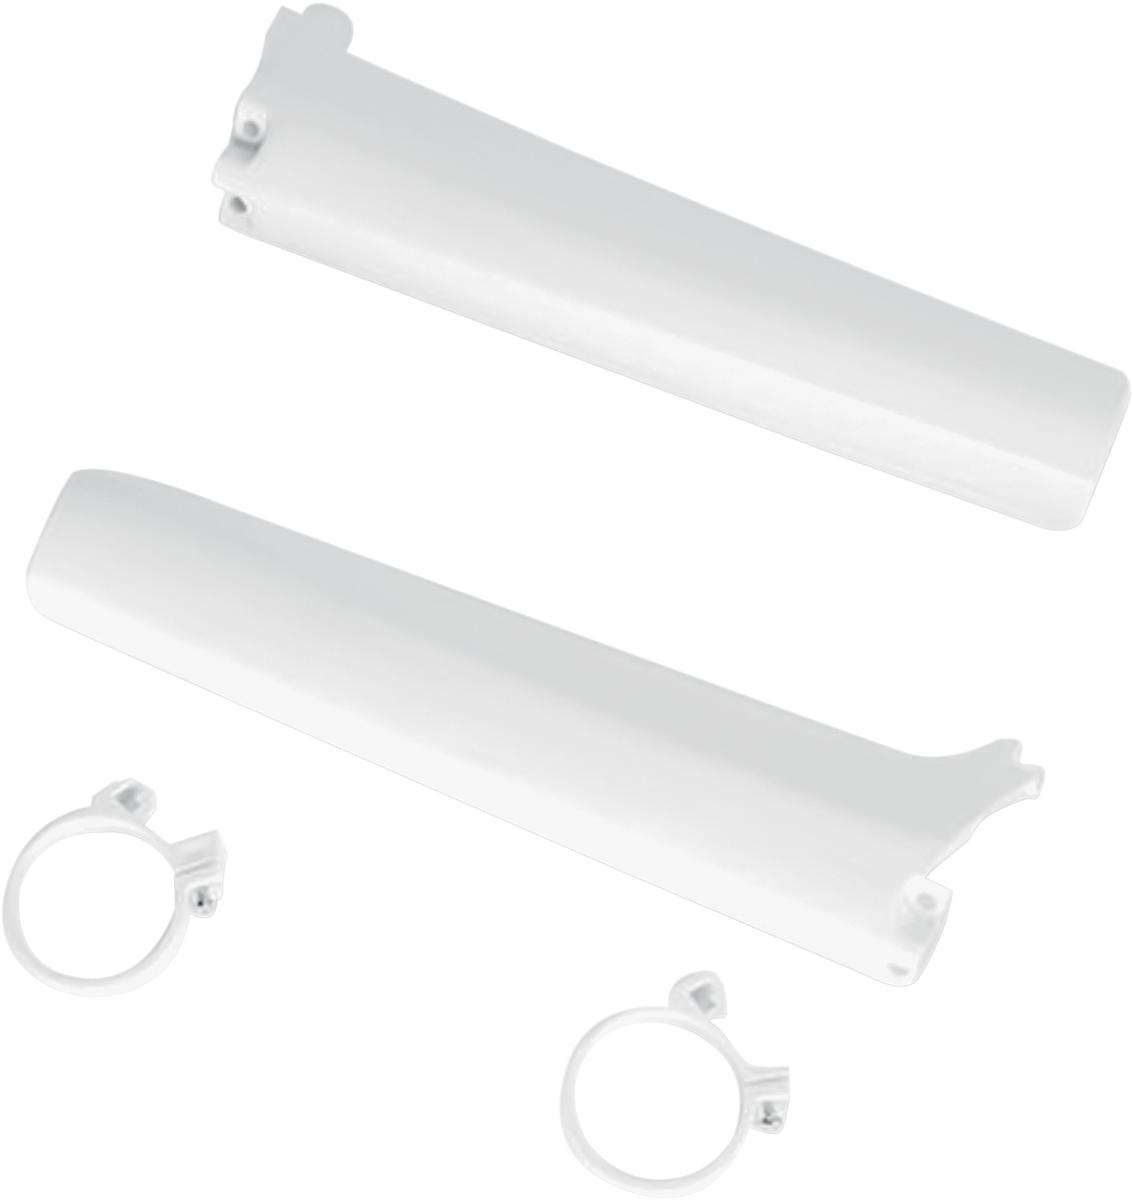 cubre barrales suzuki rm 125/250 92/93 blanco ufo